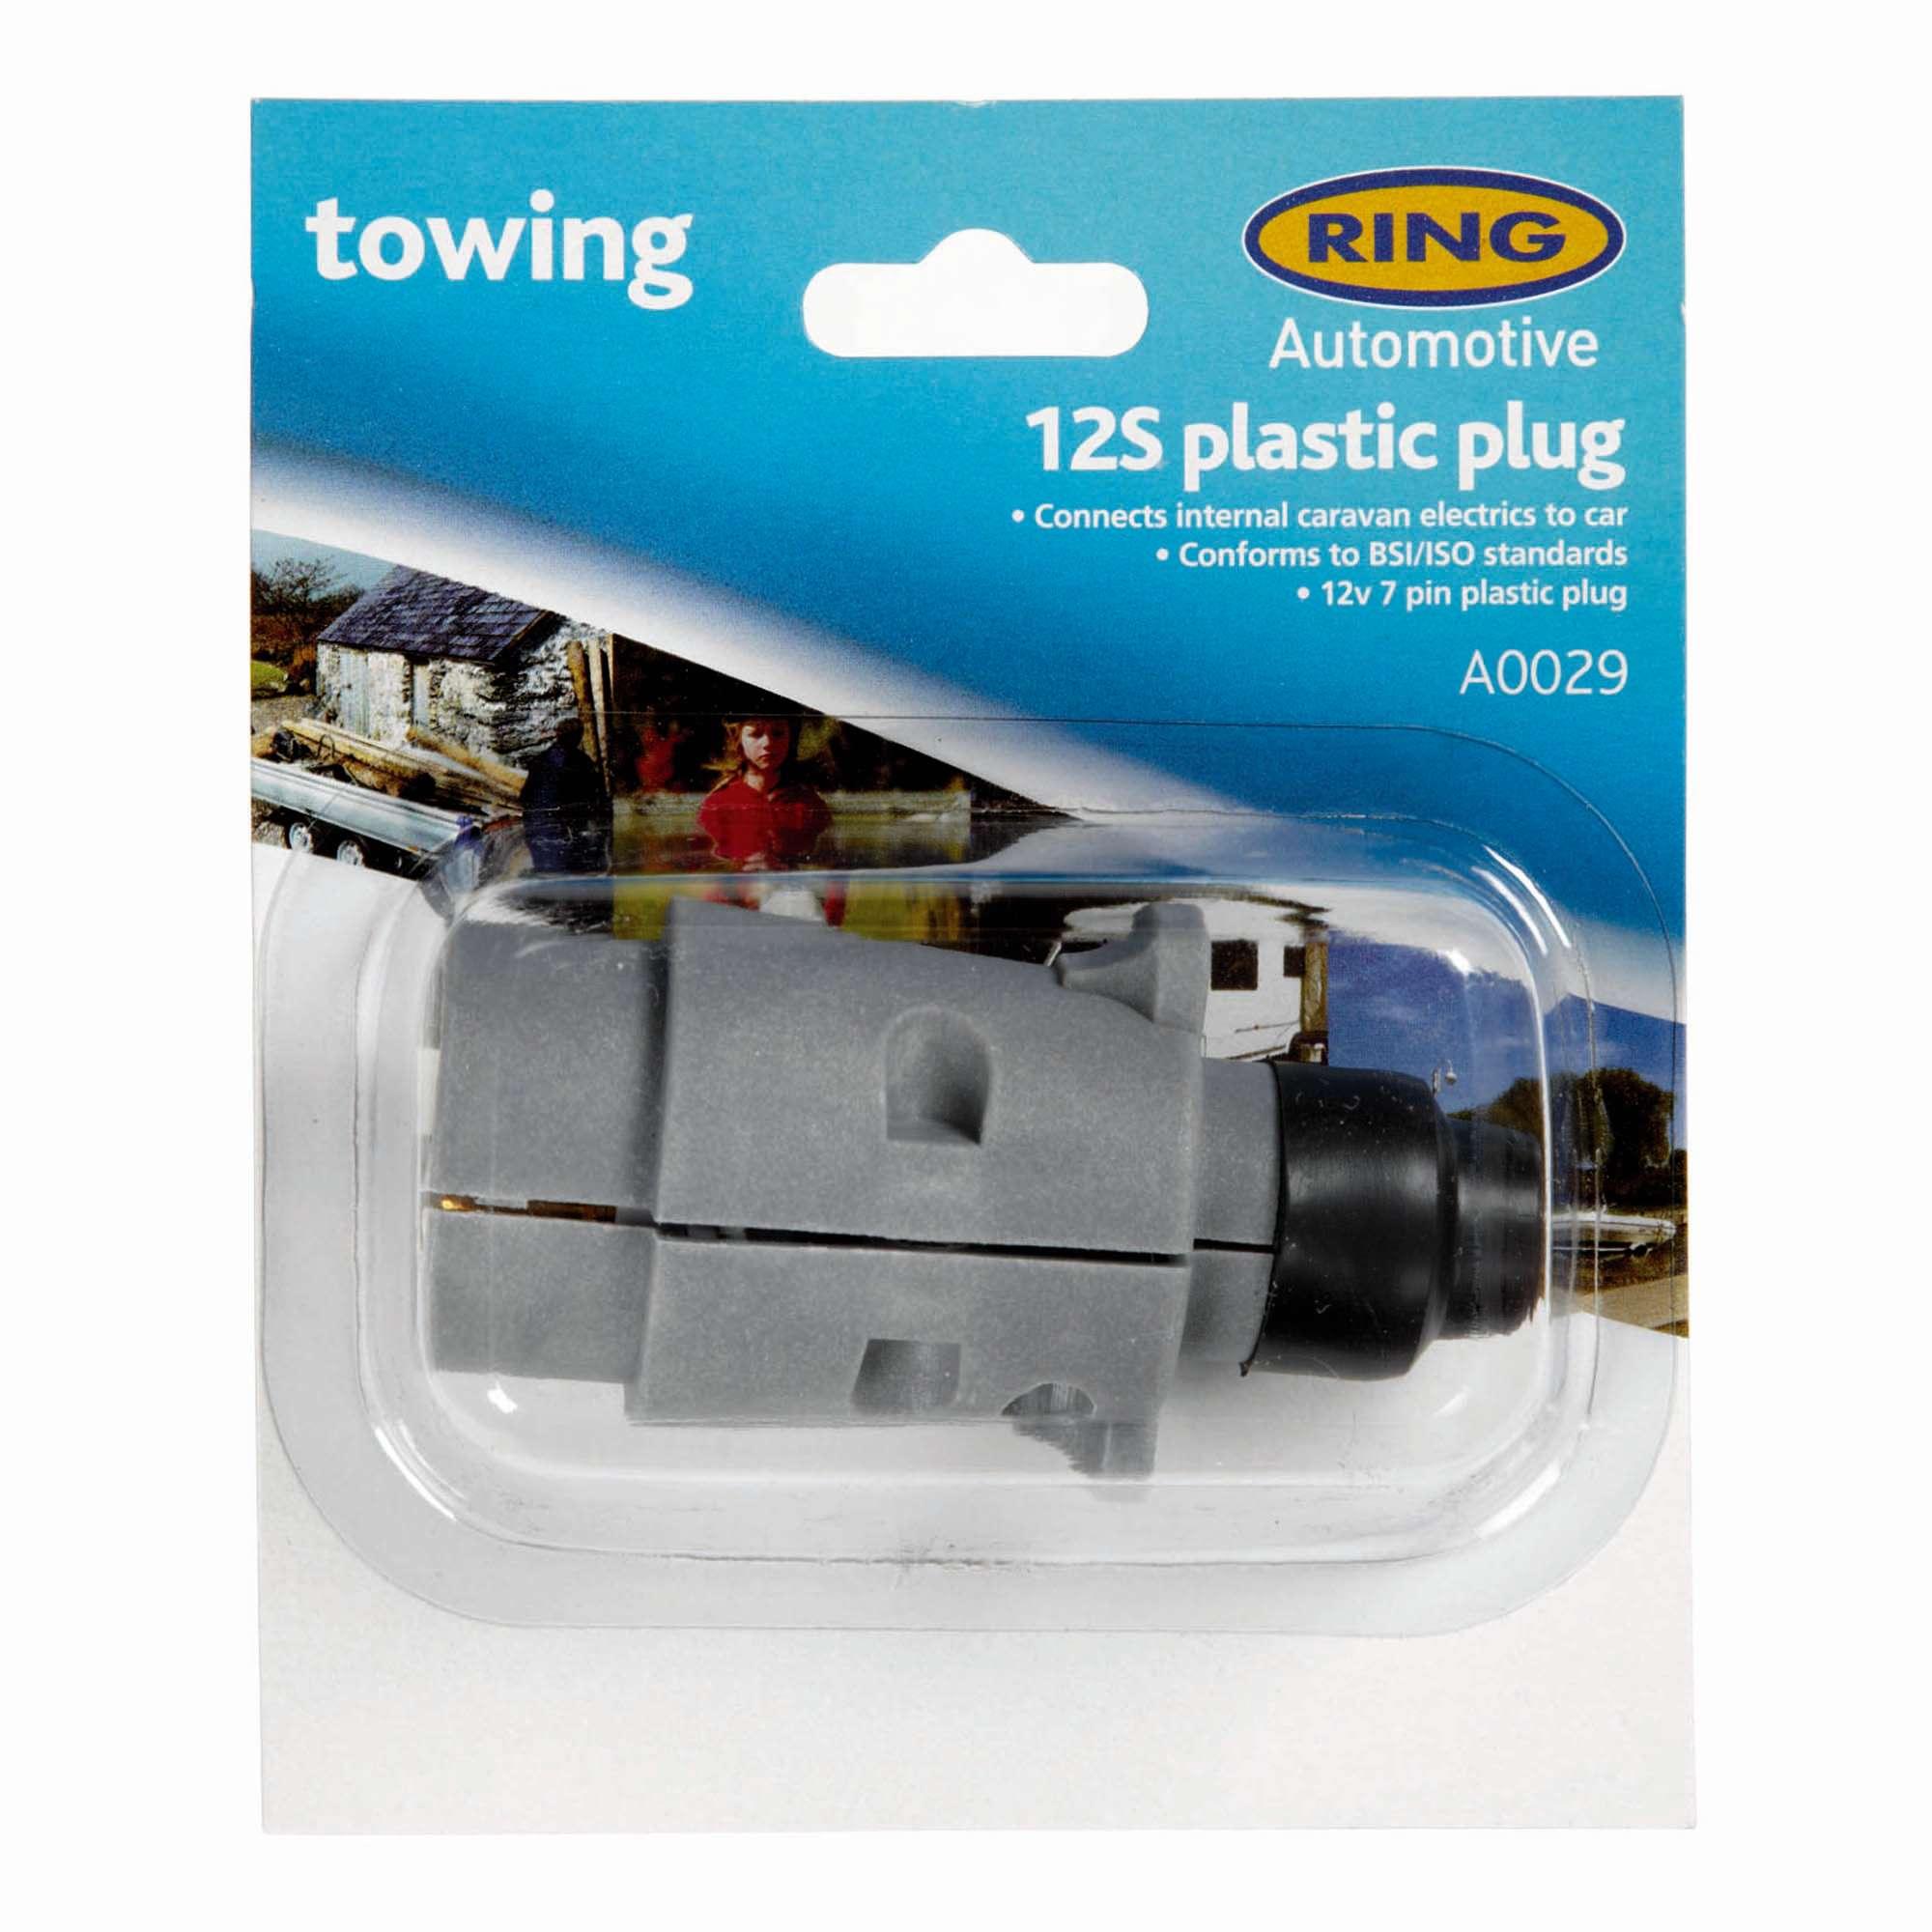 RING 12S 7 Pin Plastic Plug (A0029)